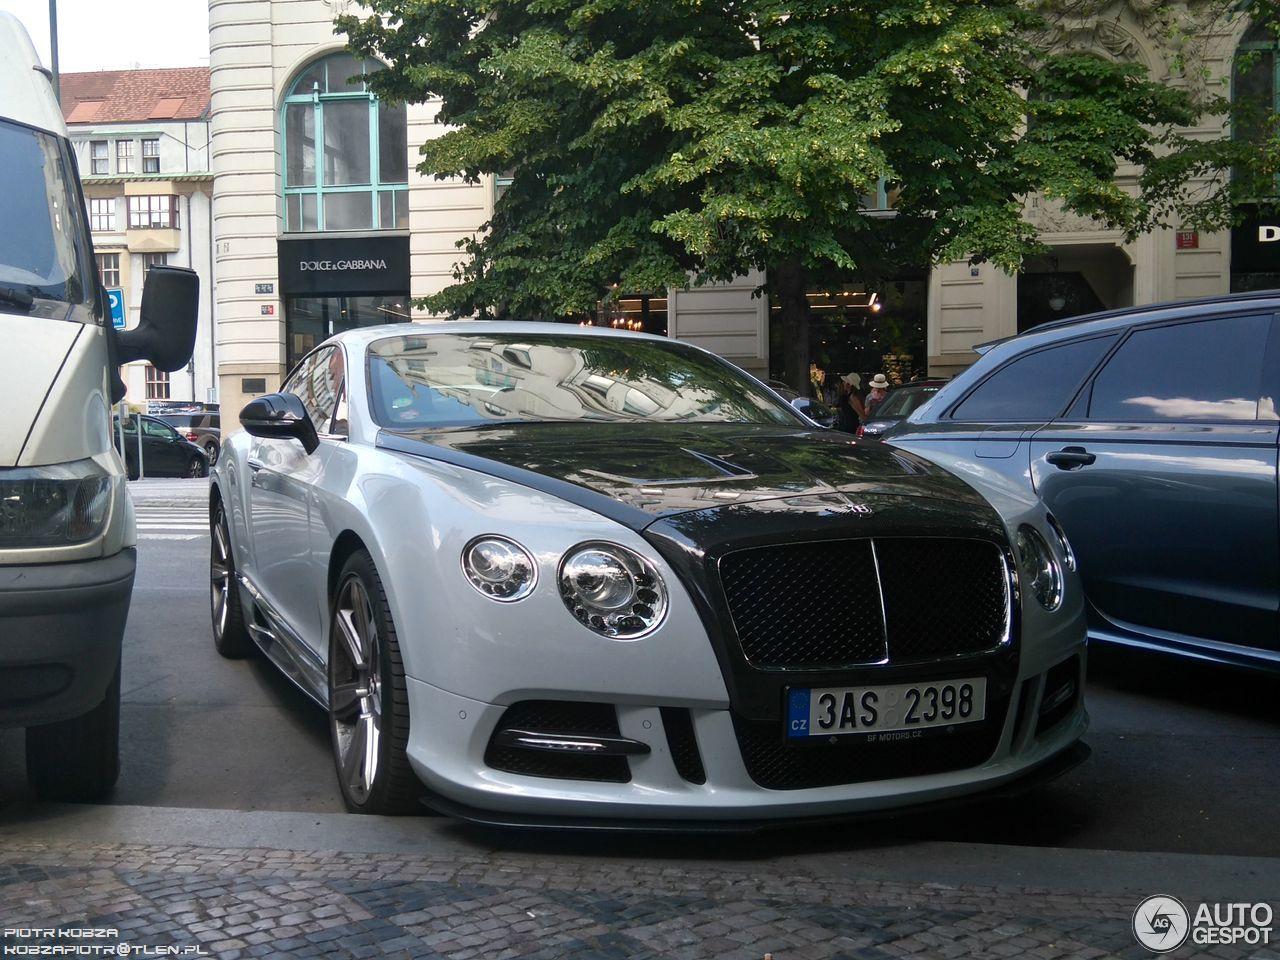 Bentley mansory continental gt v8 15 july 2017 autogespot 1 i bentley mansory continental gt v8 1 vanachro Gallery